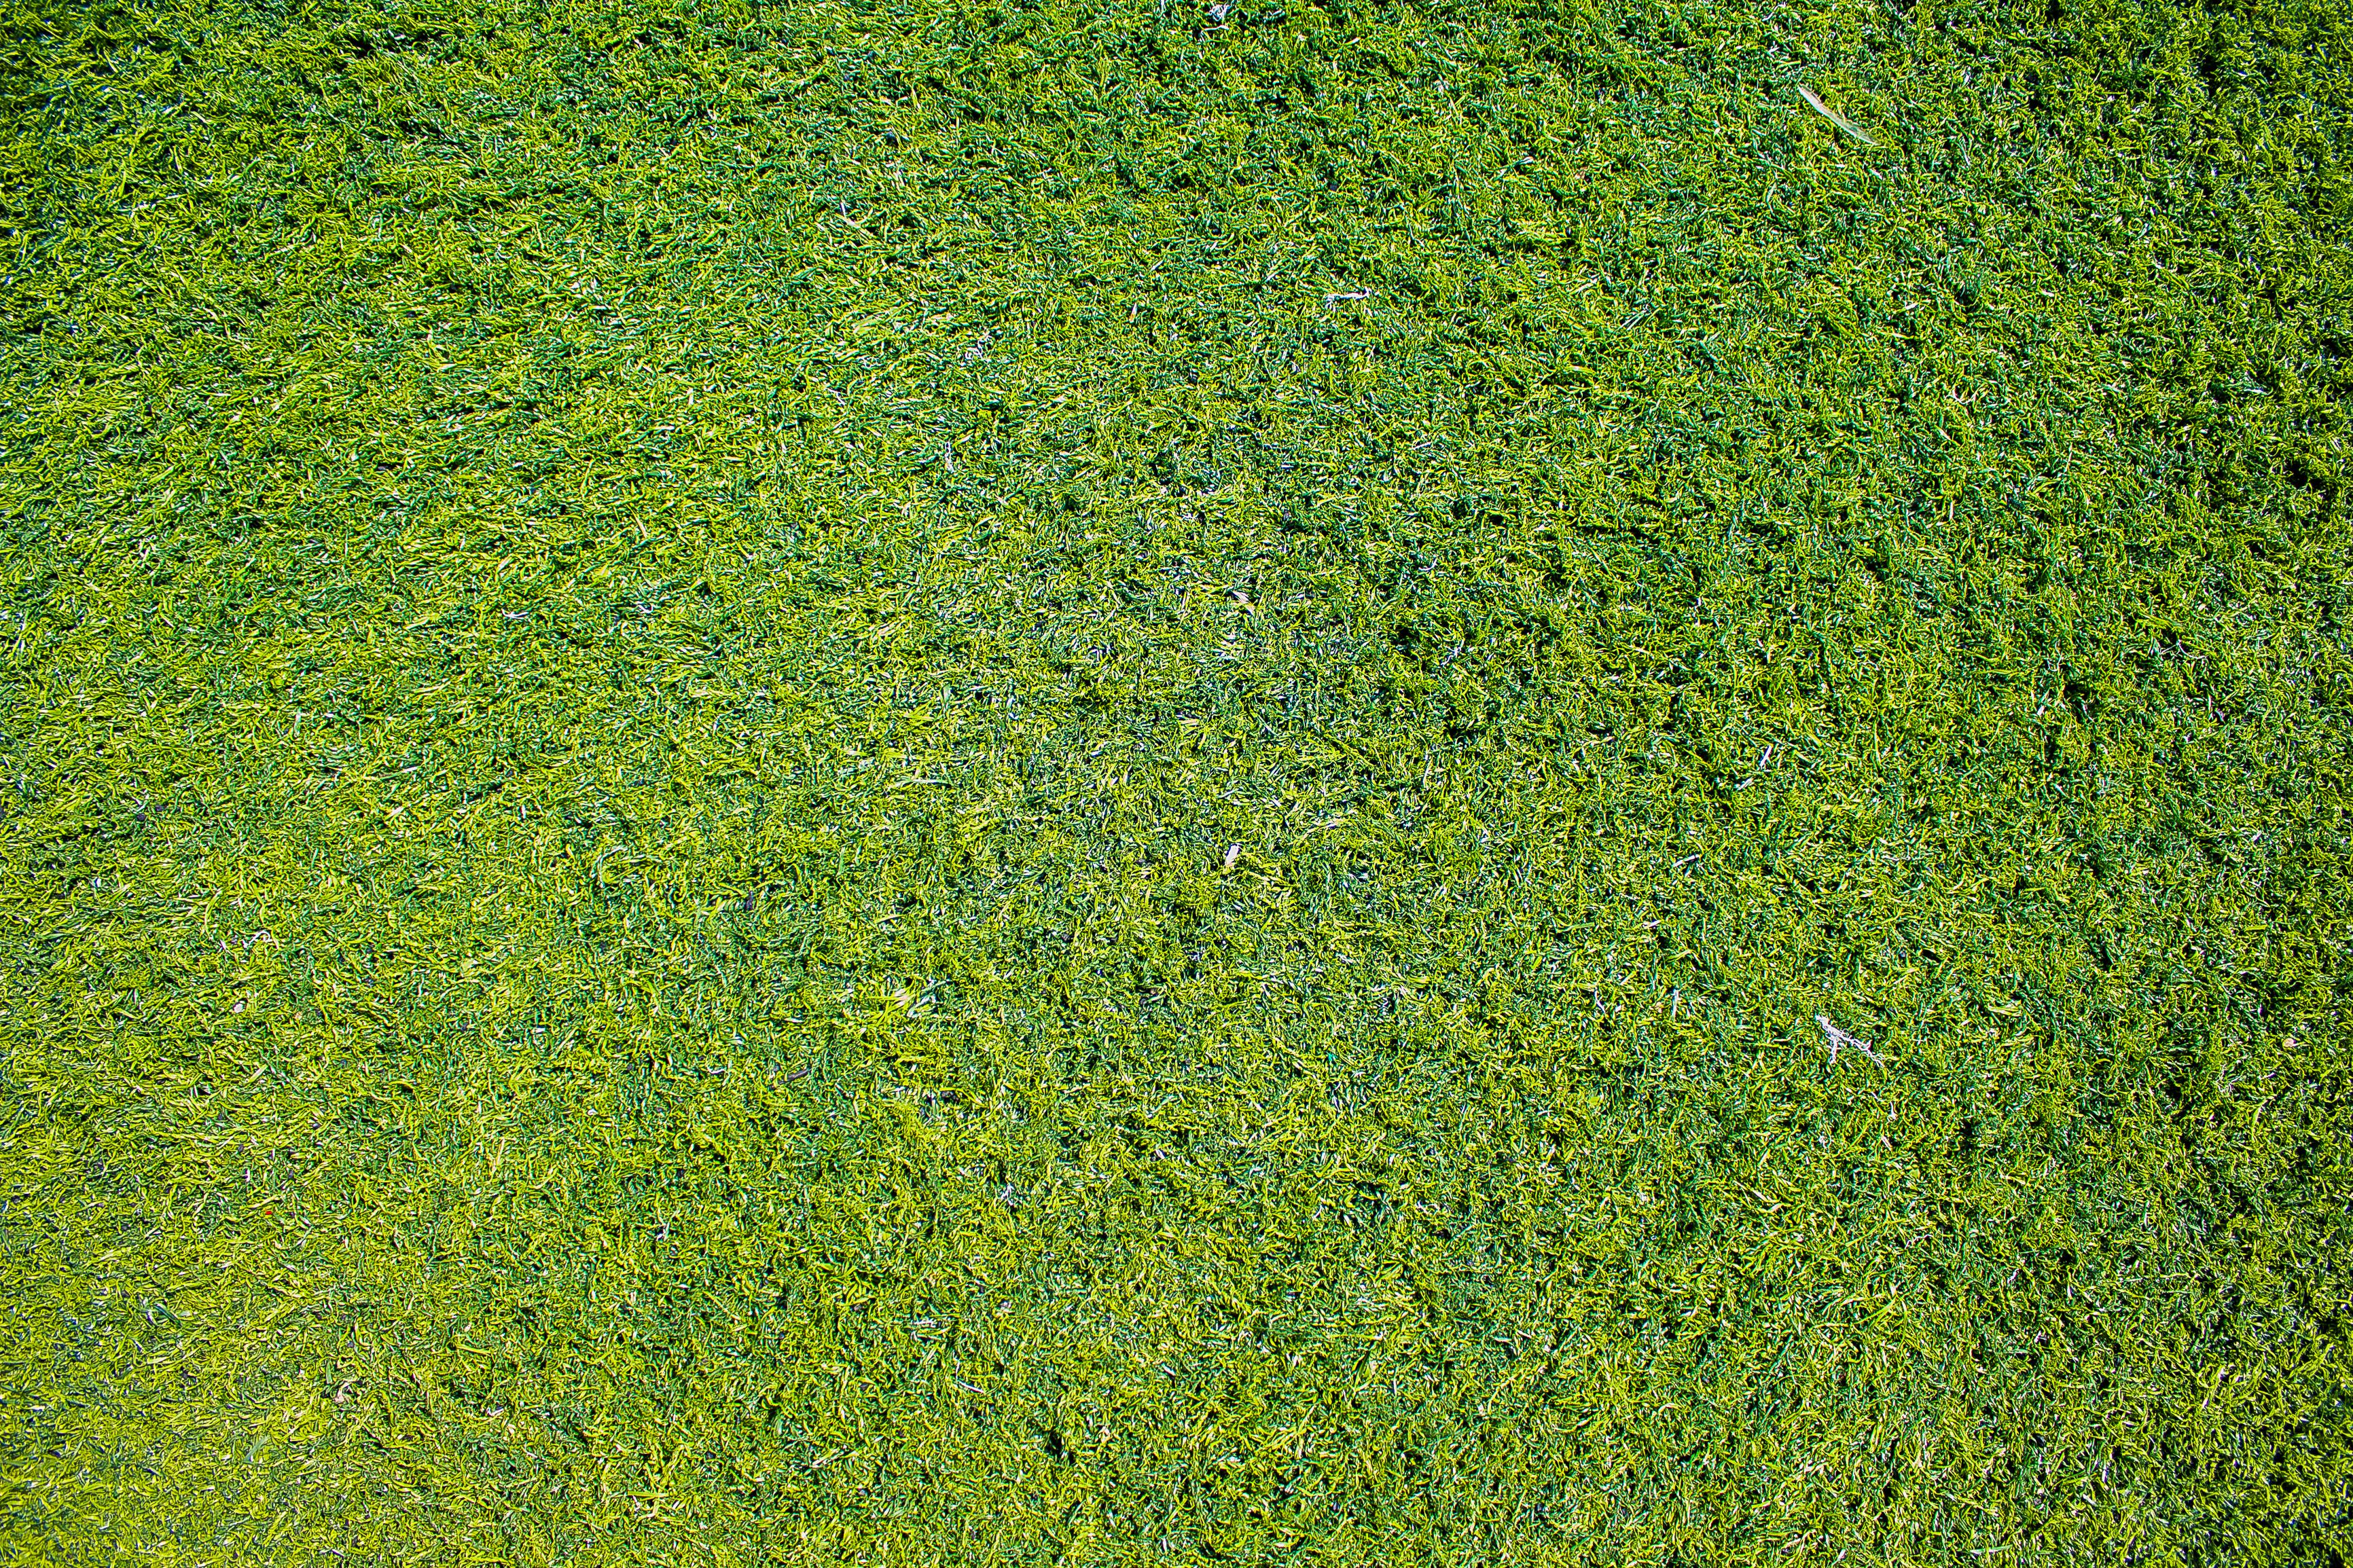 grass texture - Falco ifreezer co